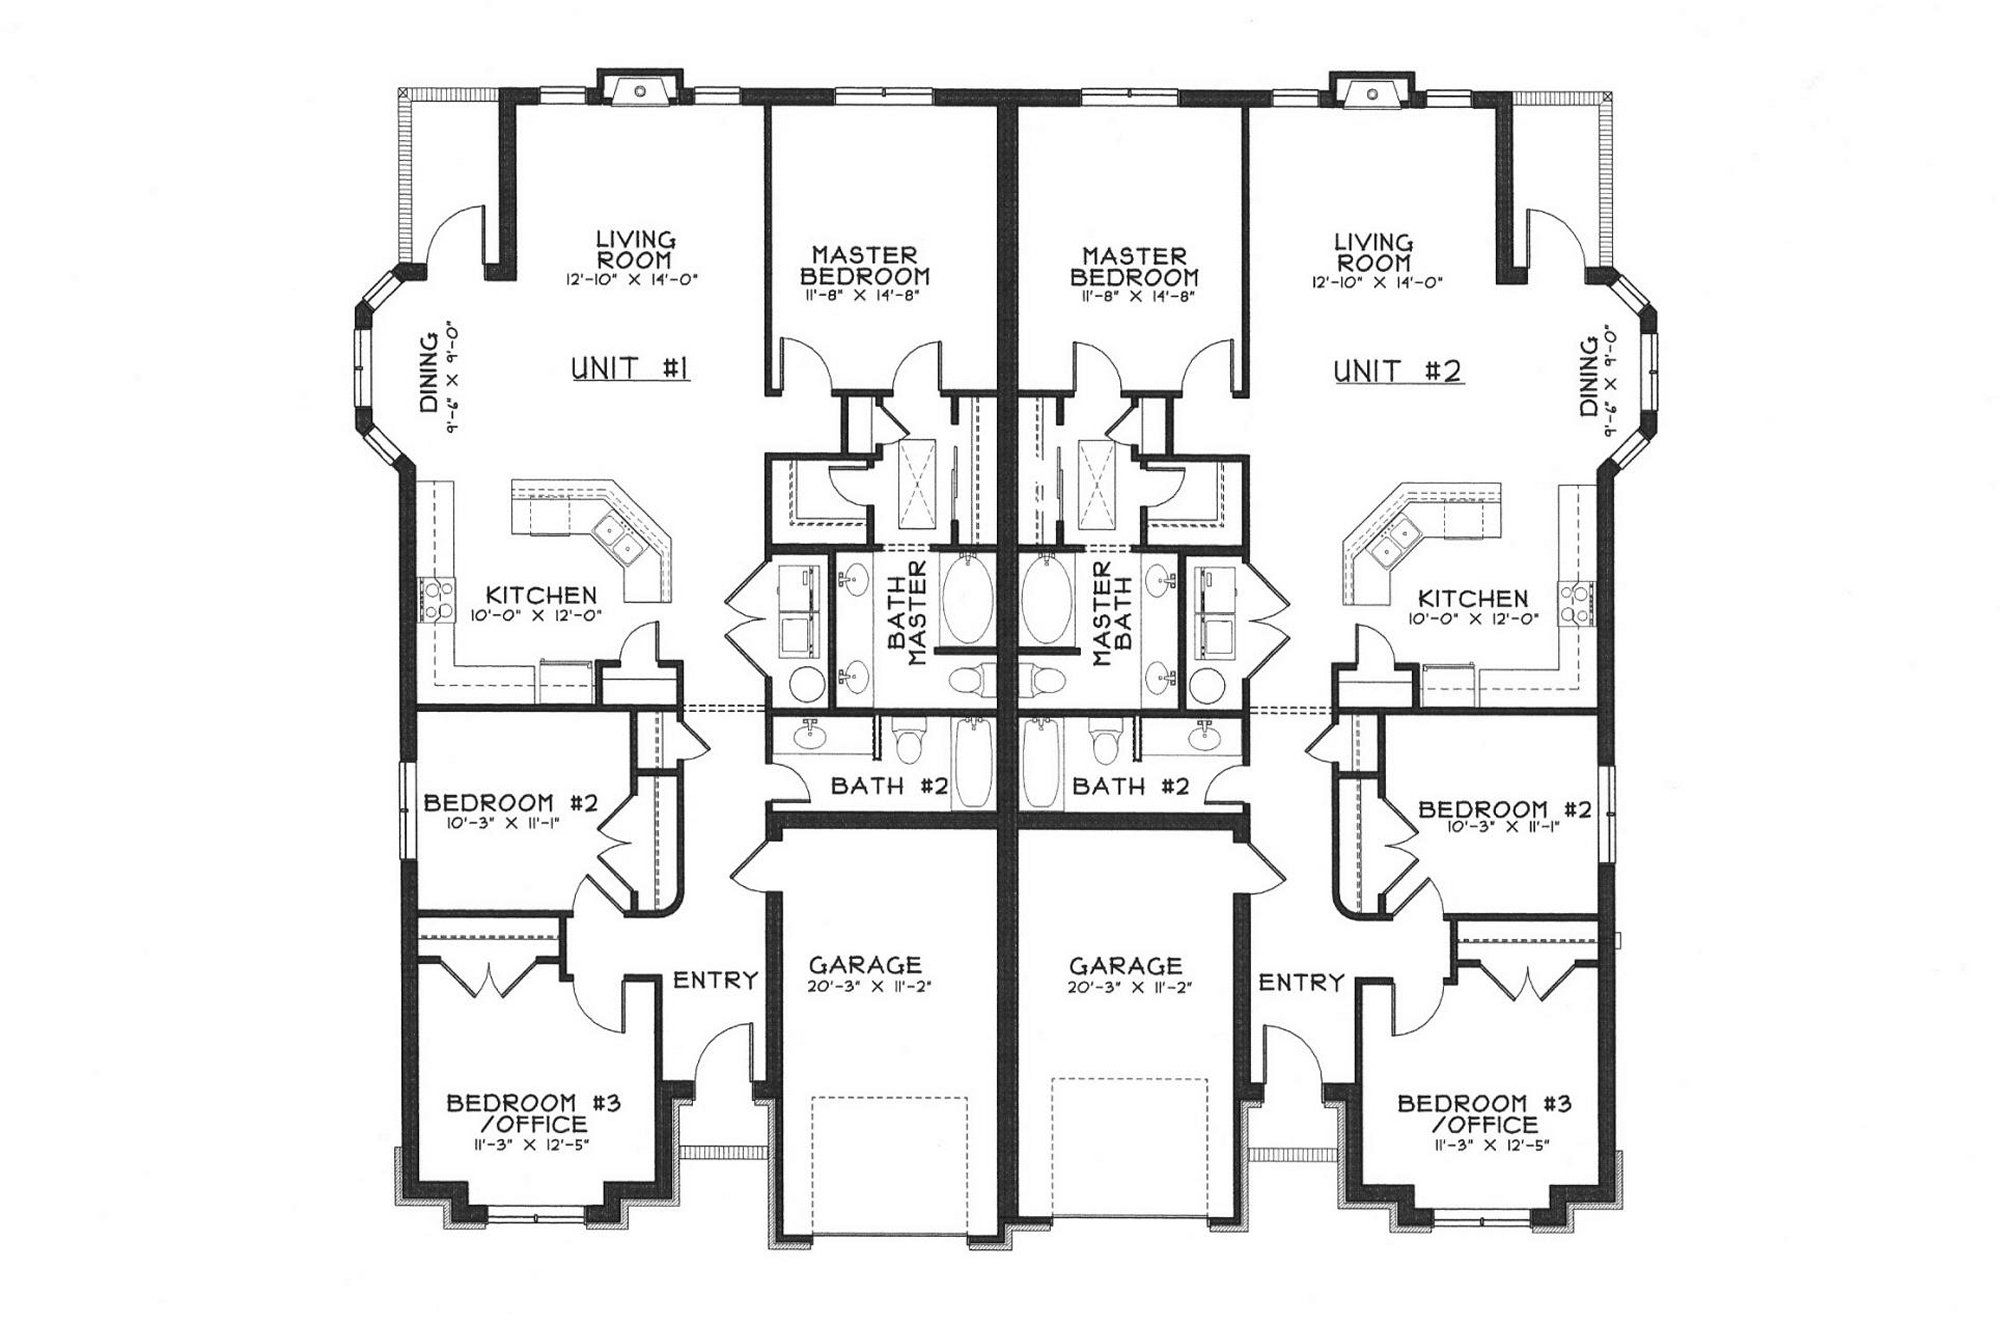 Best Images About Duplex House Plans On Pinterest House Plans Home Plan Designer